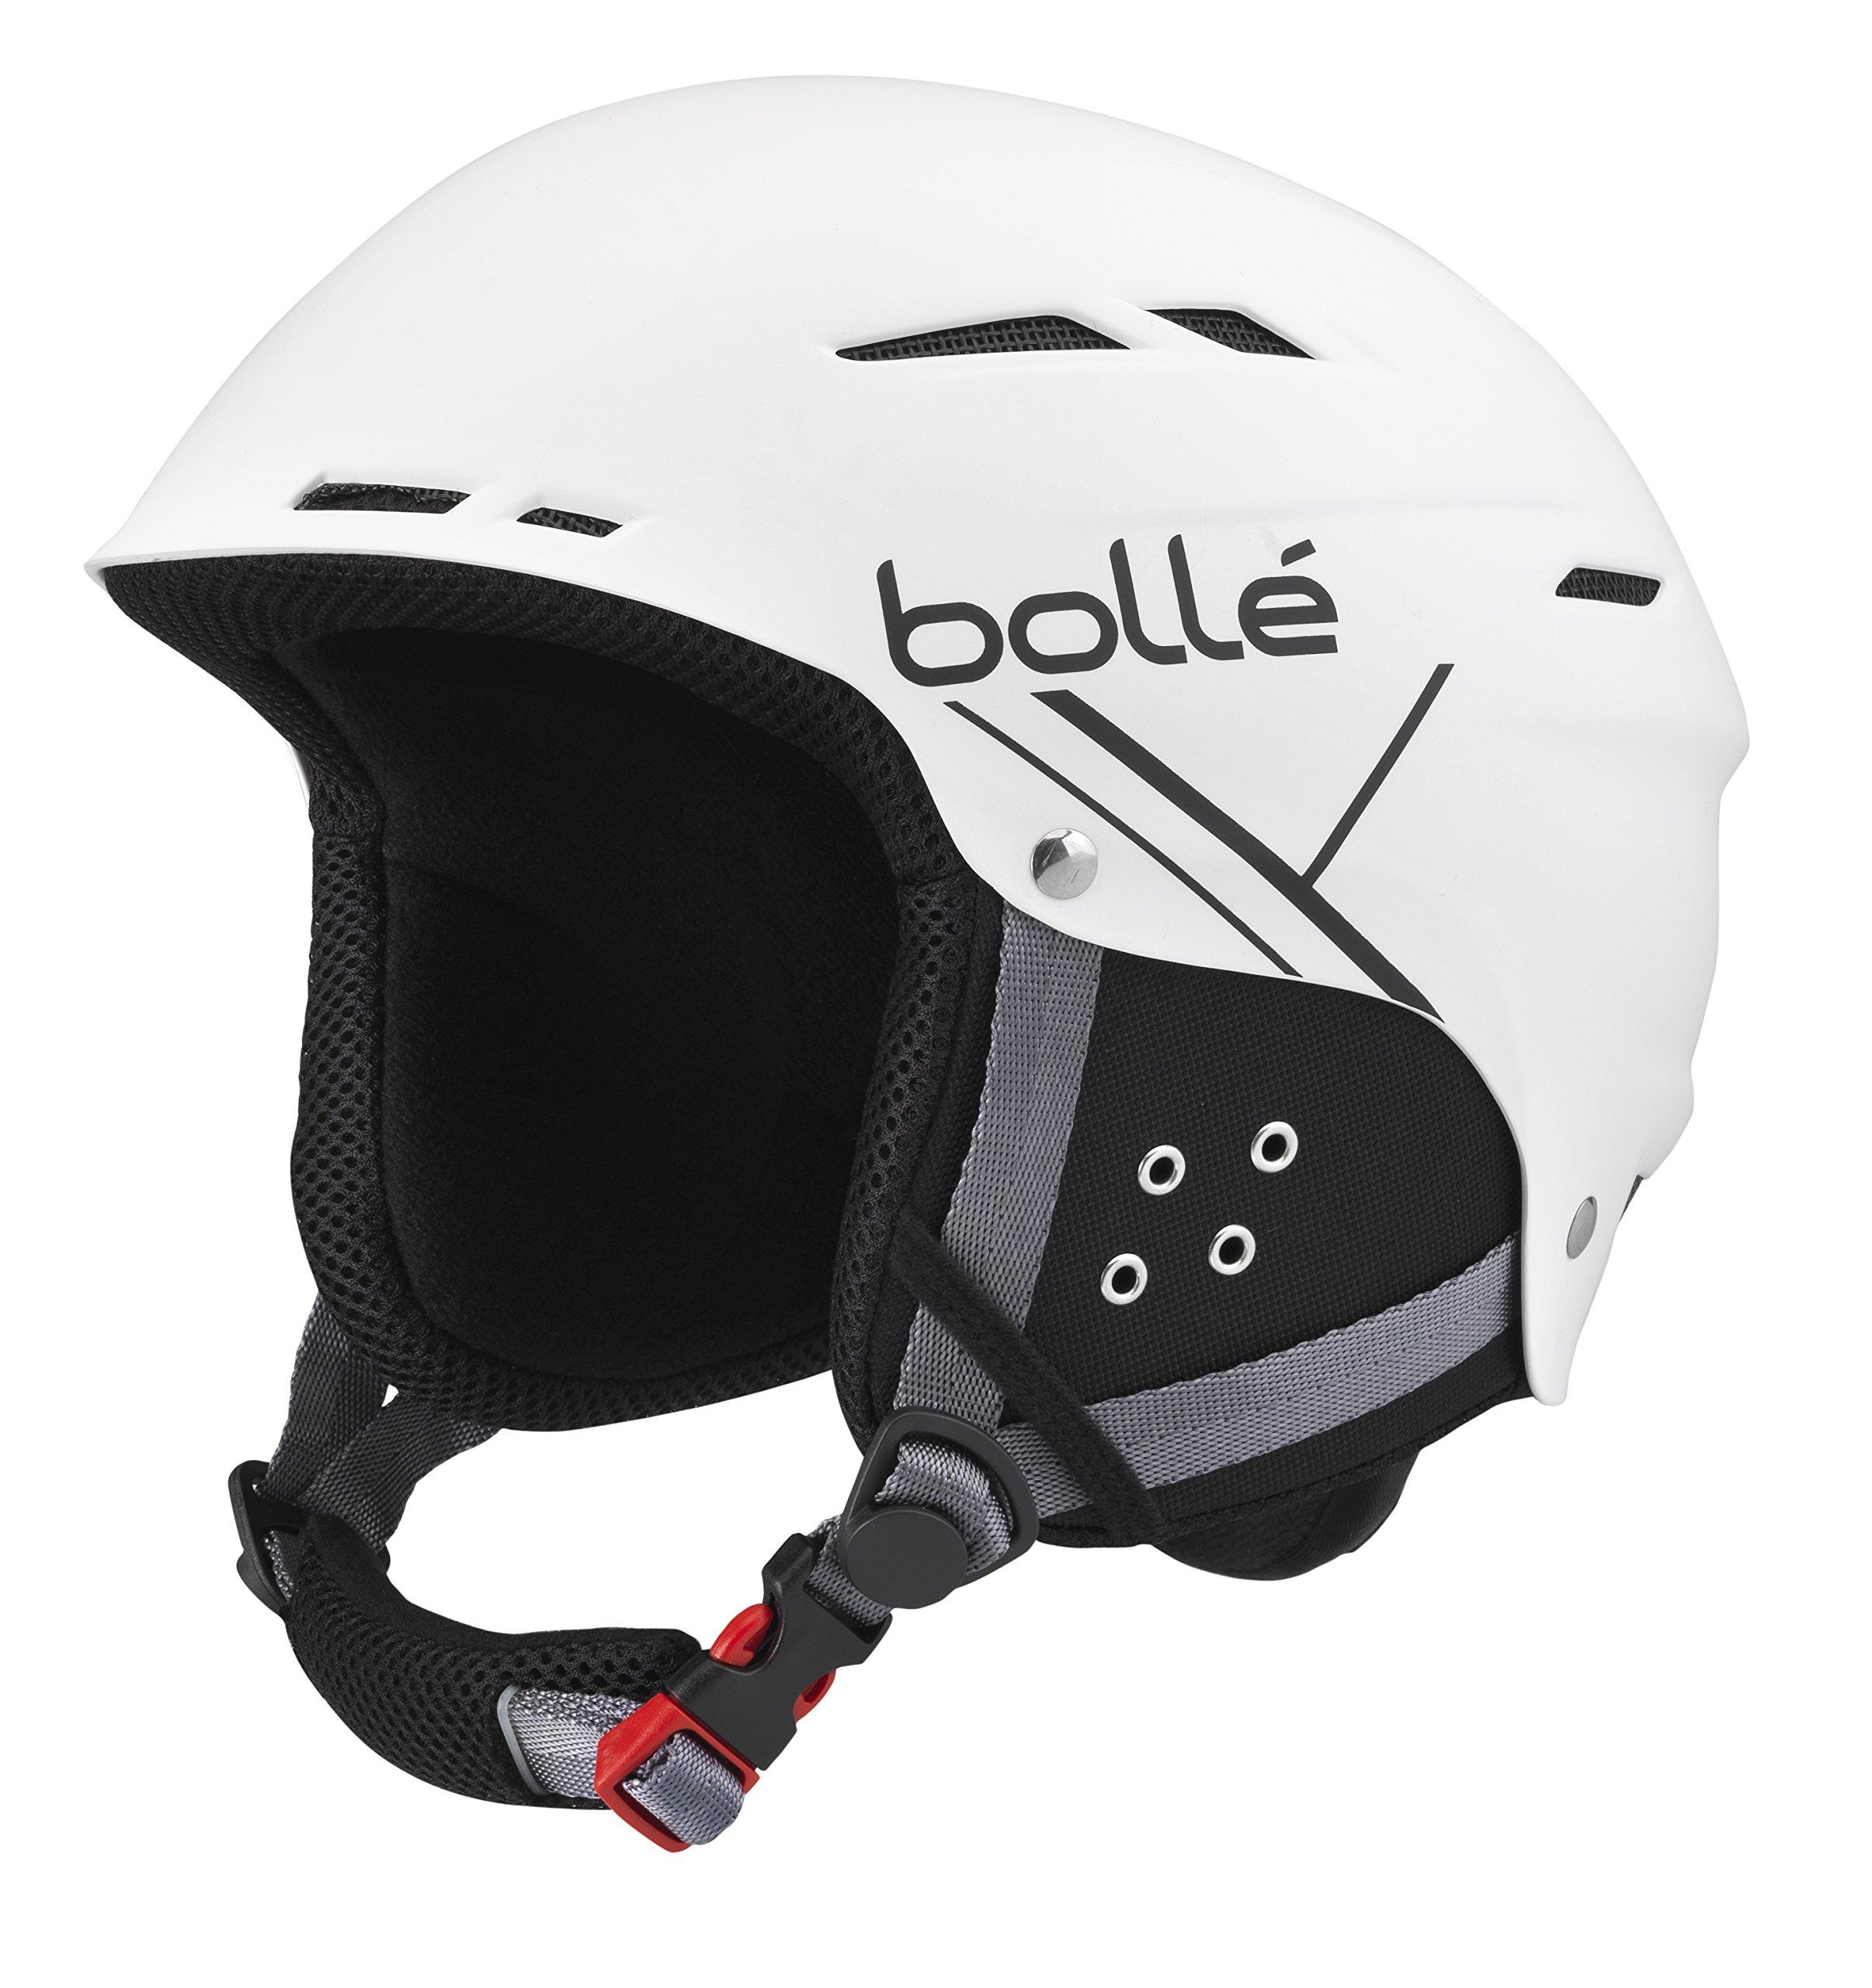 Bolle B-Fun Soft Helmet, White/Black, 58-61cm